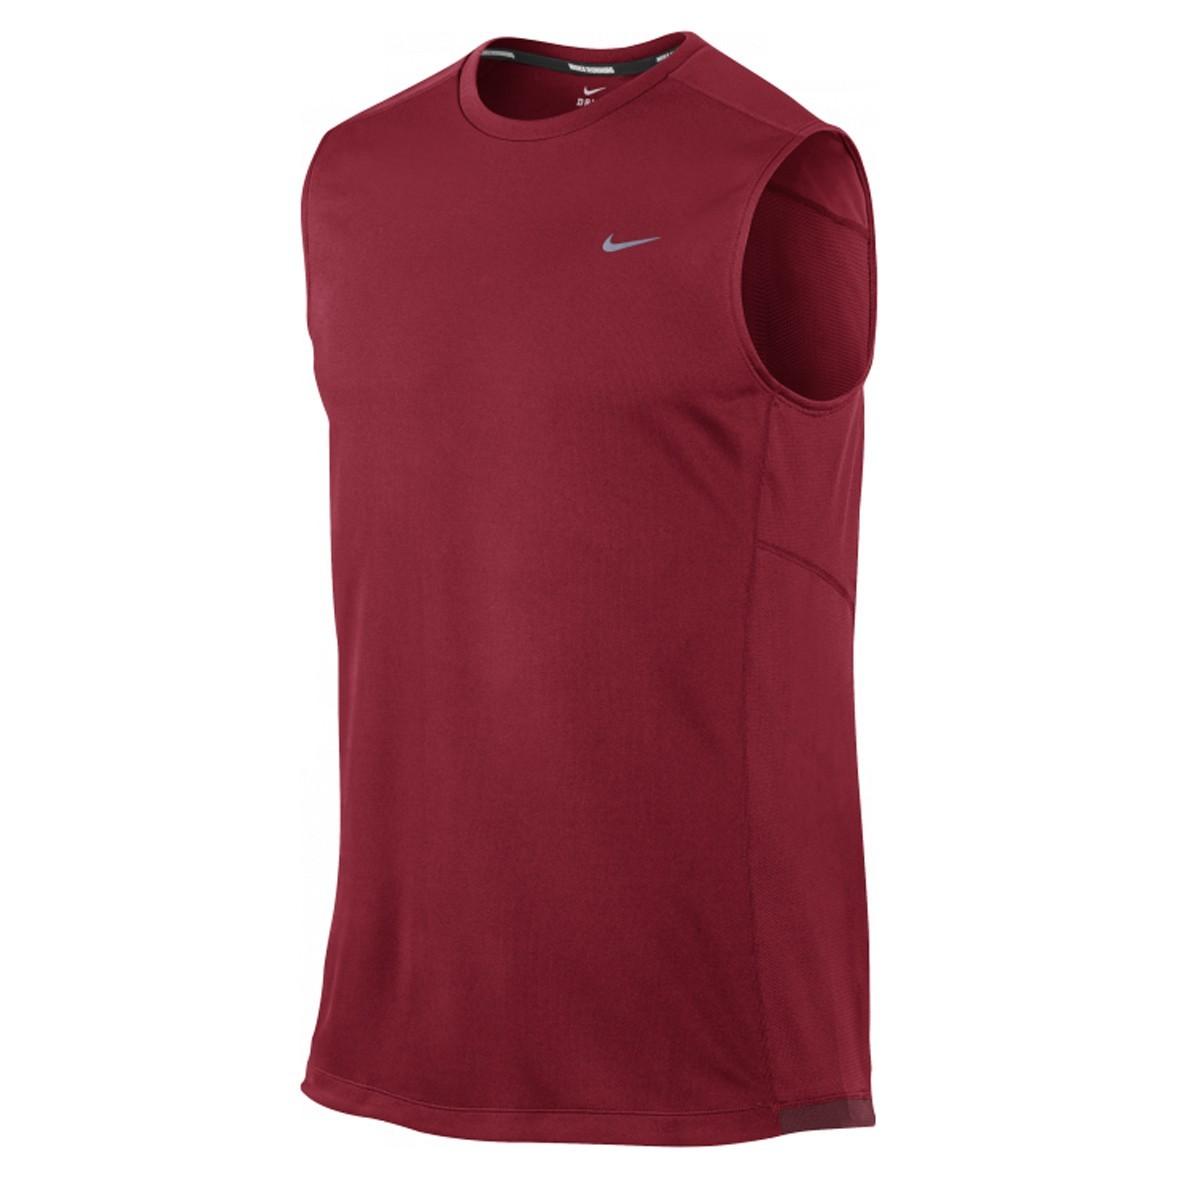 1b92be61e4 Camiseta Nike Sem Manga Miler SL - Masculino